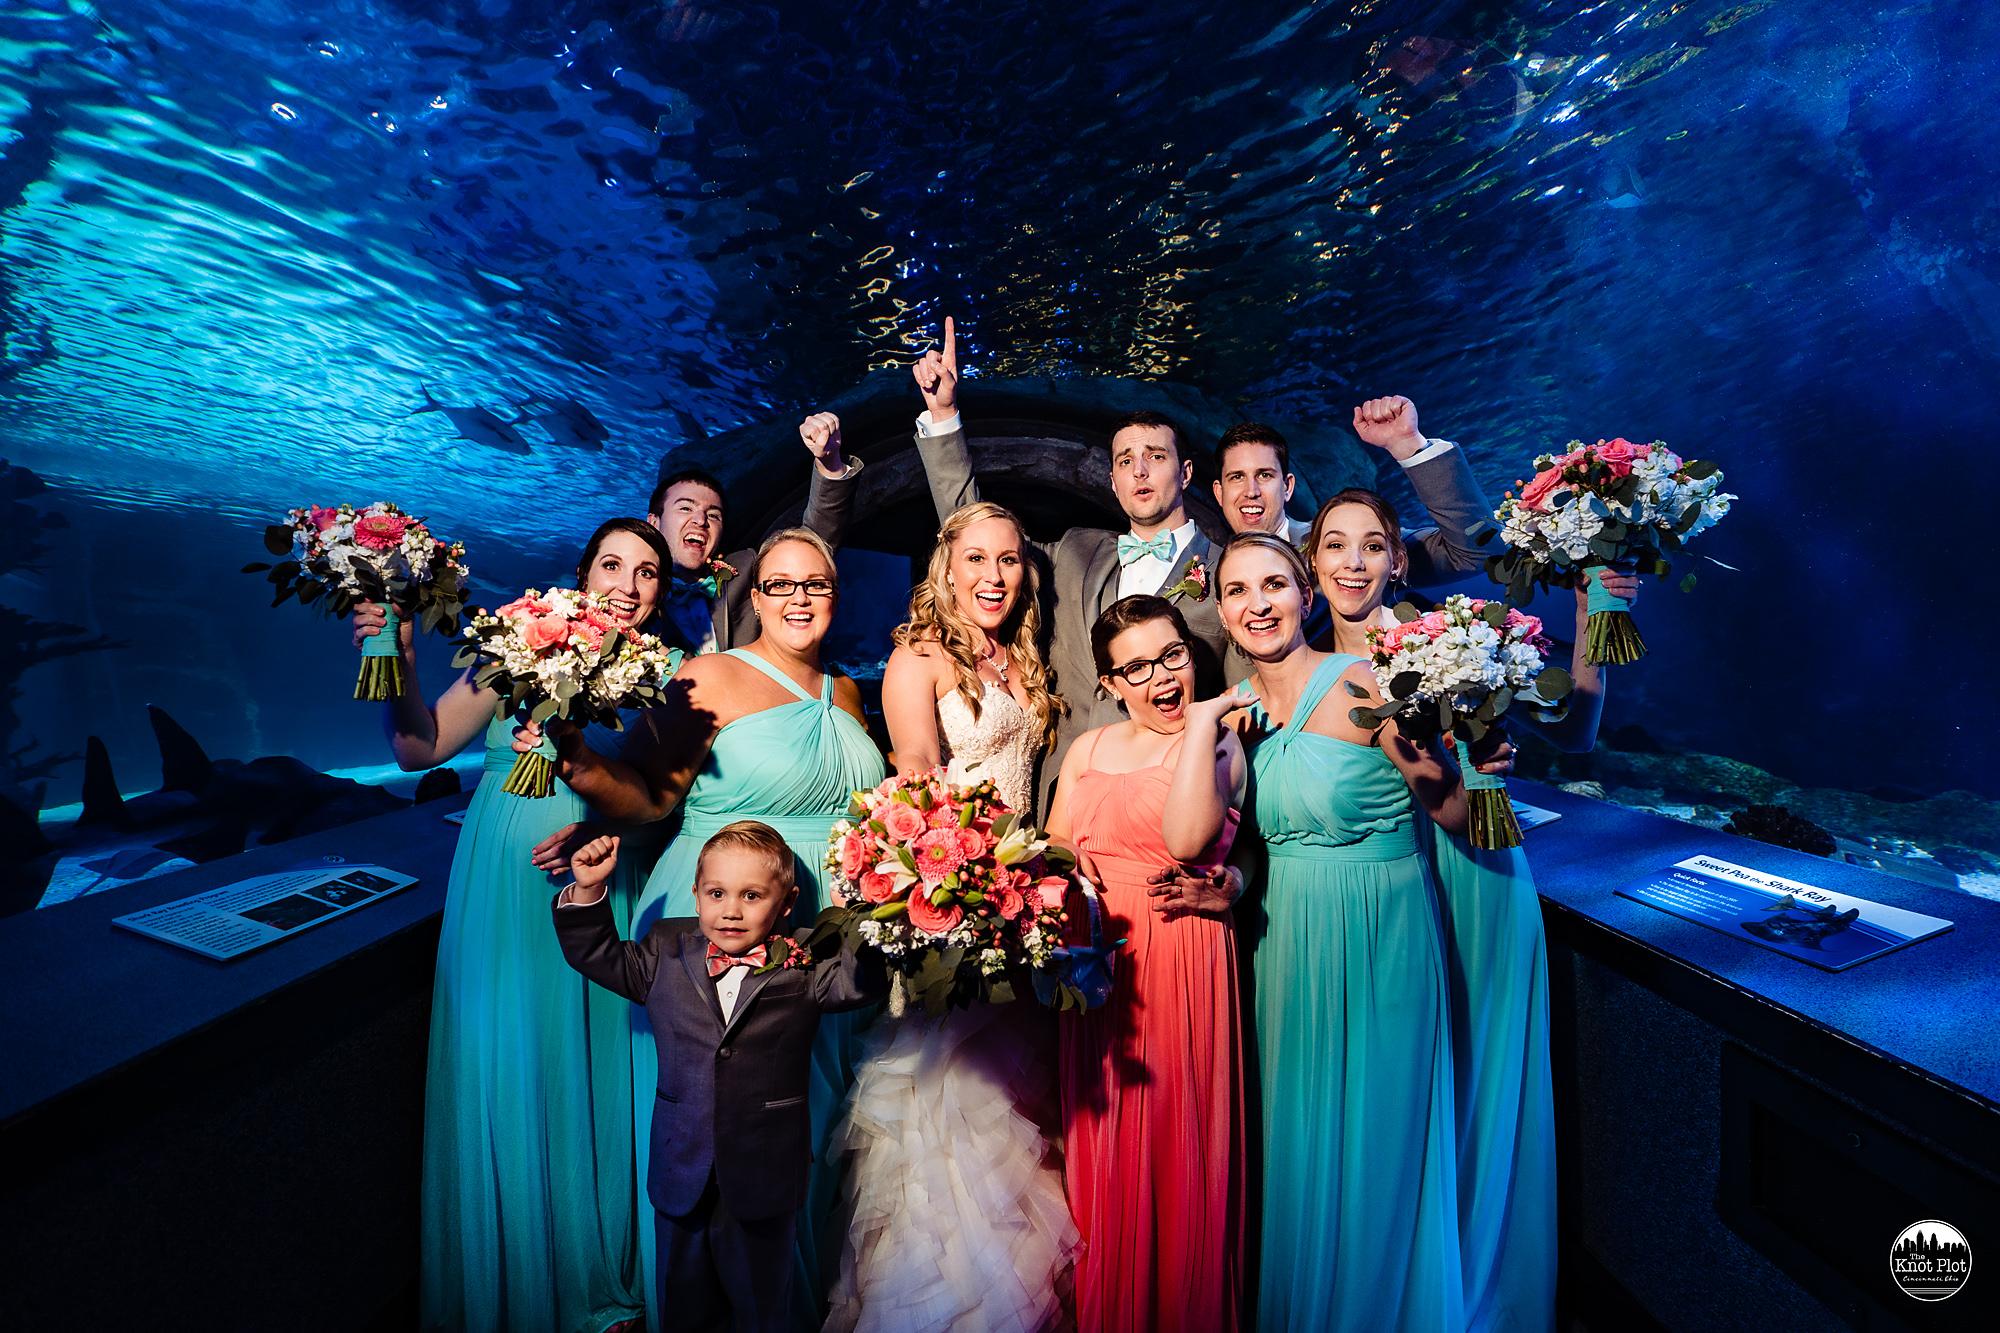 Newport-Aquarium-Wedding-Photos-16.jpg